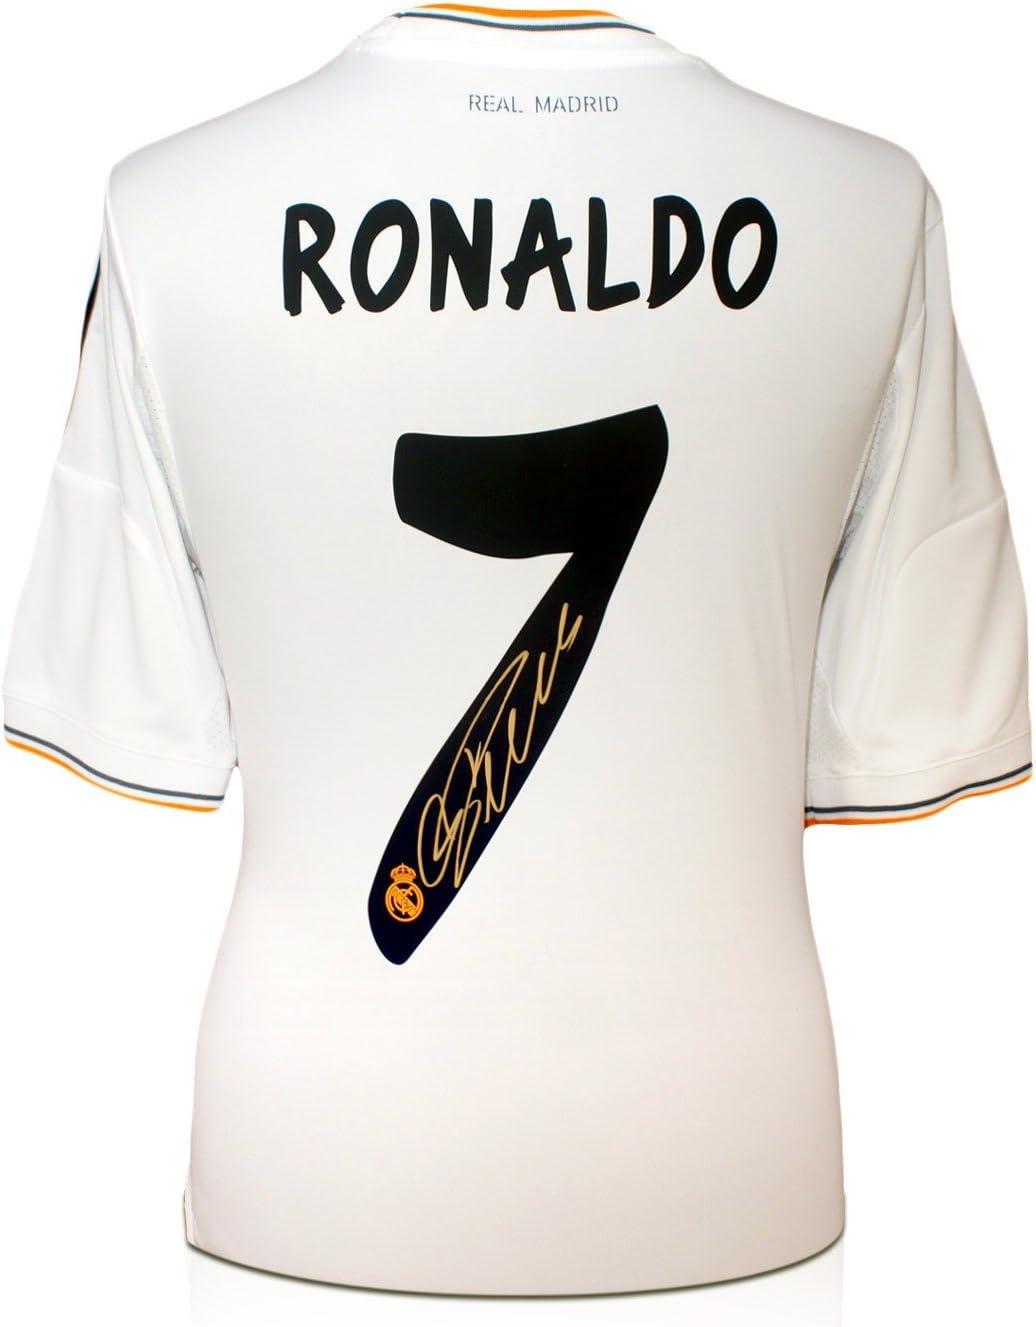 Cristiano Ronaldo Signed Real Madrid Football Shirt Amazon Co Uk Sports Outdoors